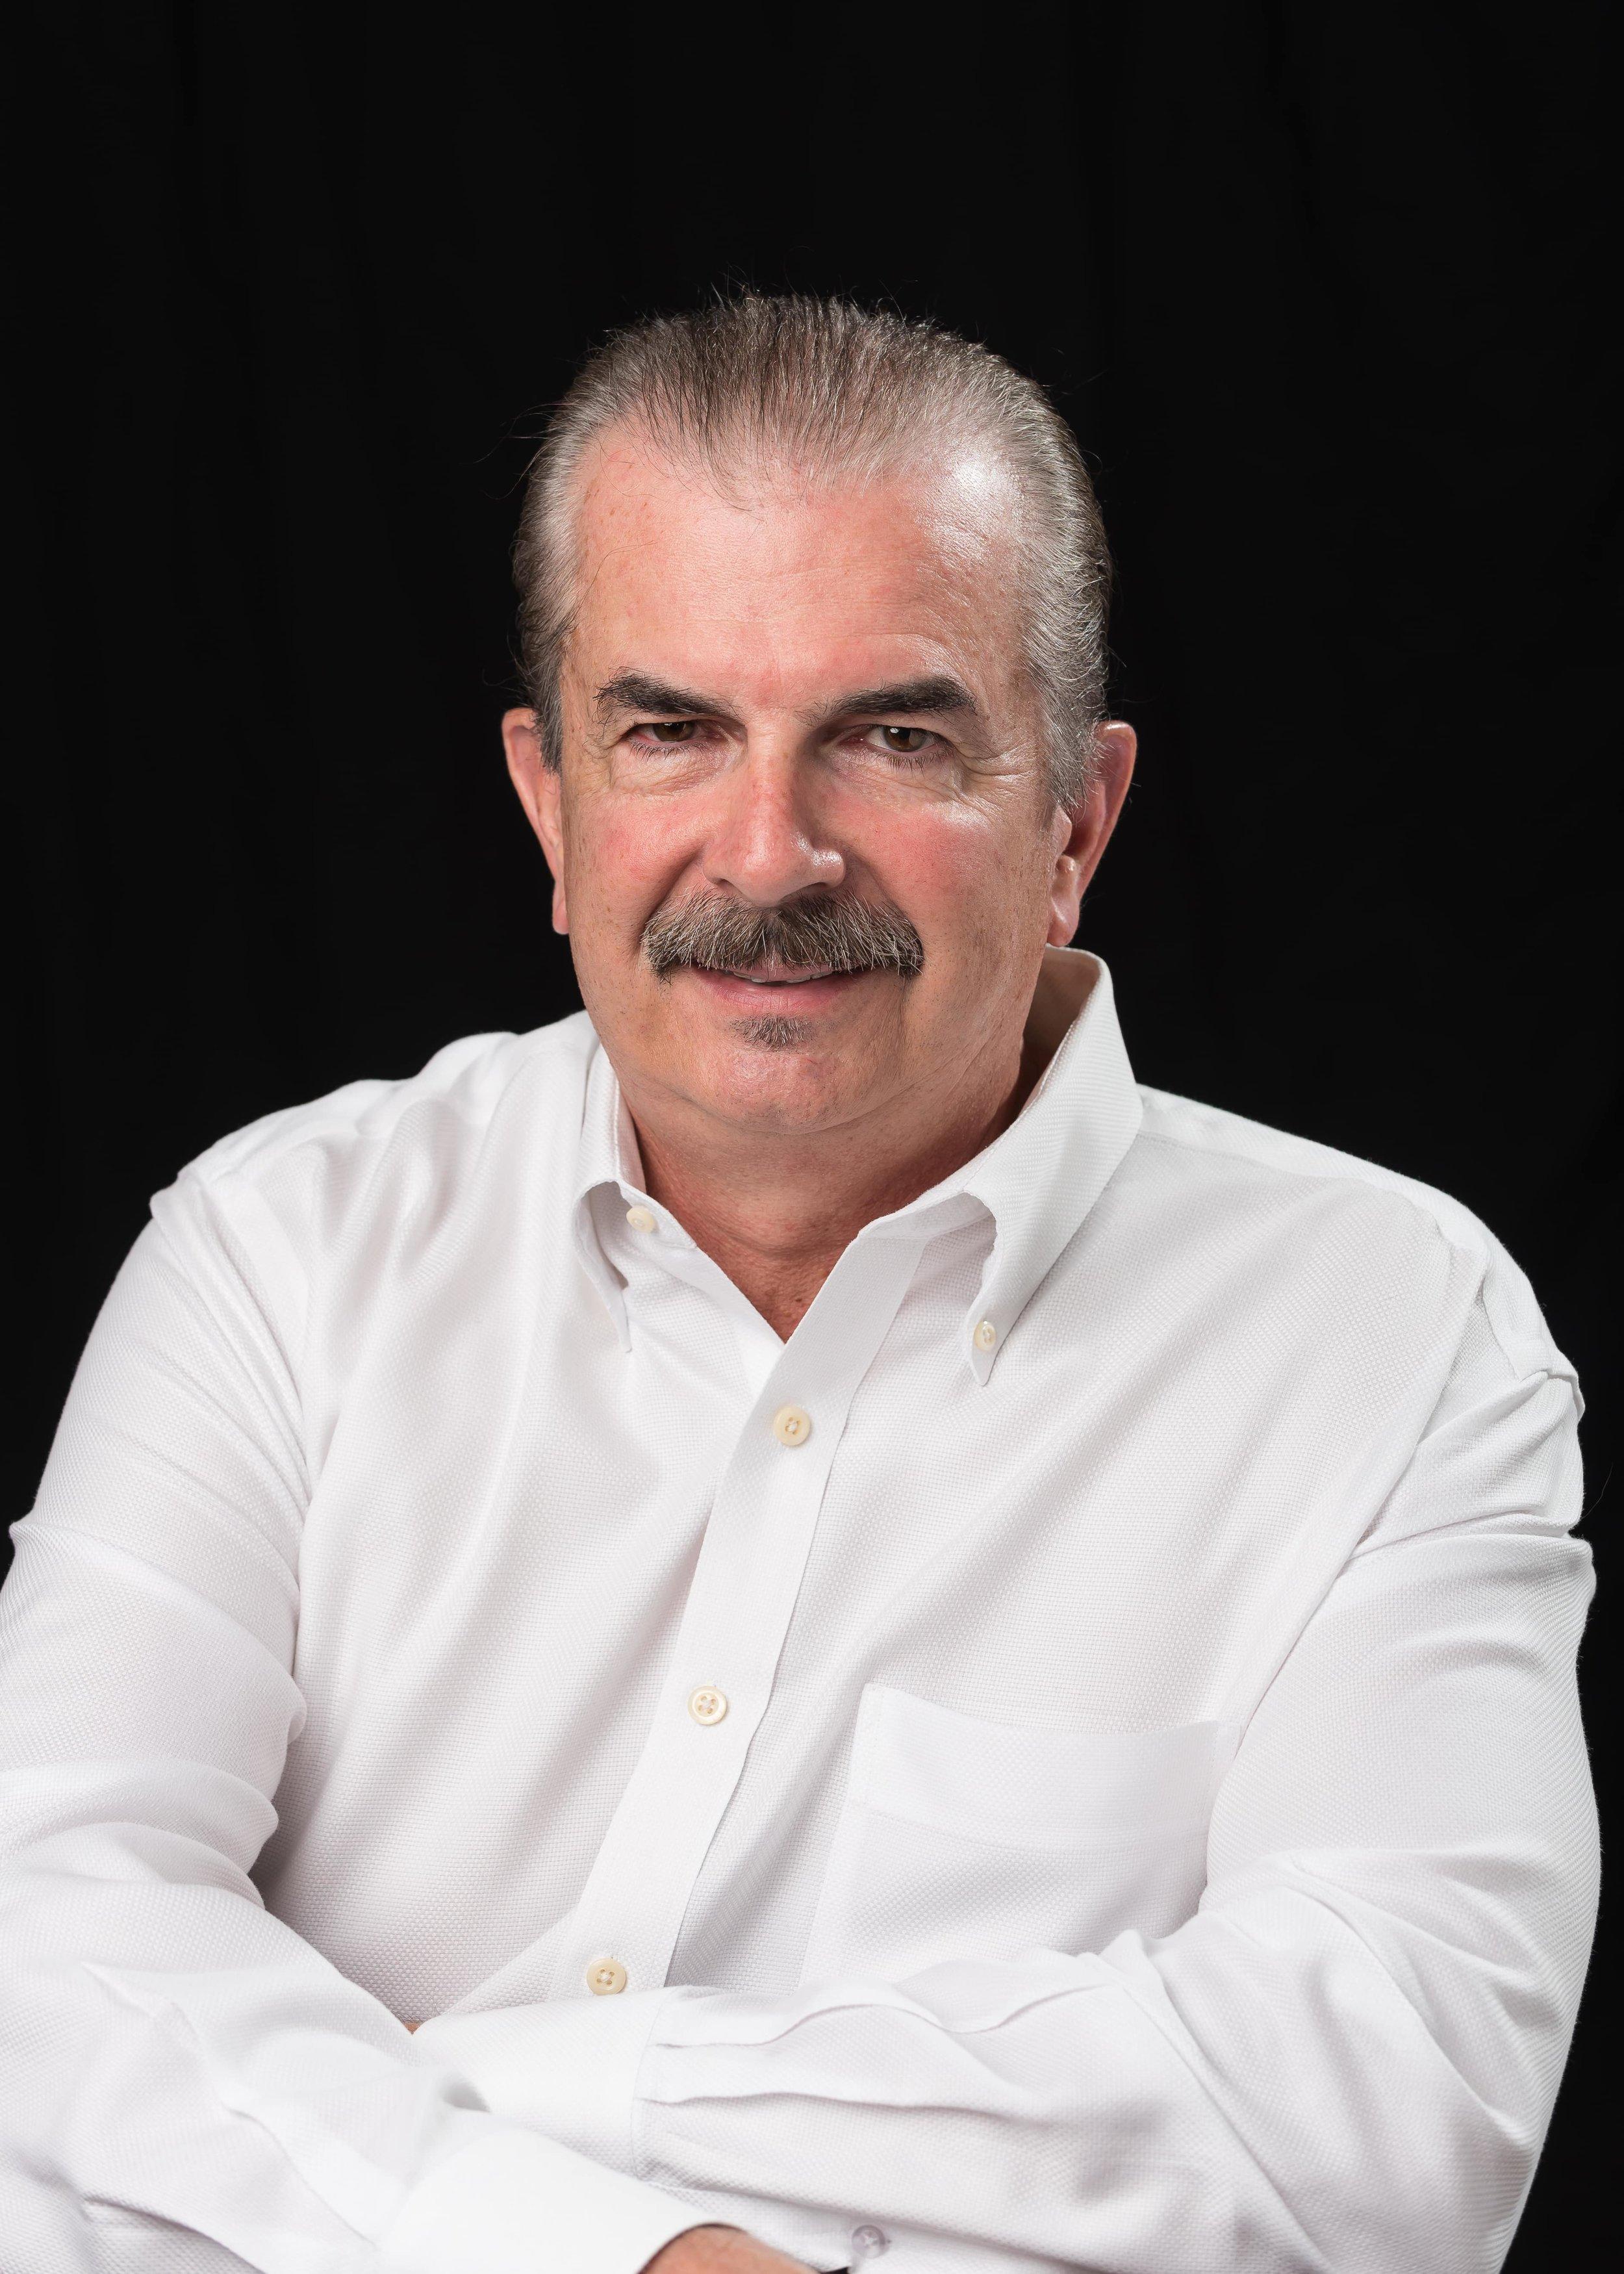 Professional Headshot Tony-CC0114.jpg